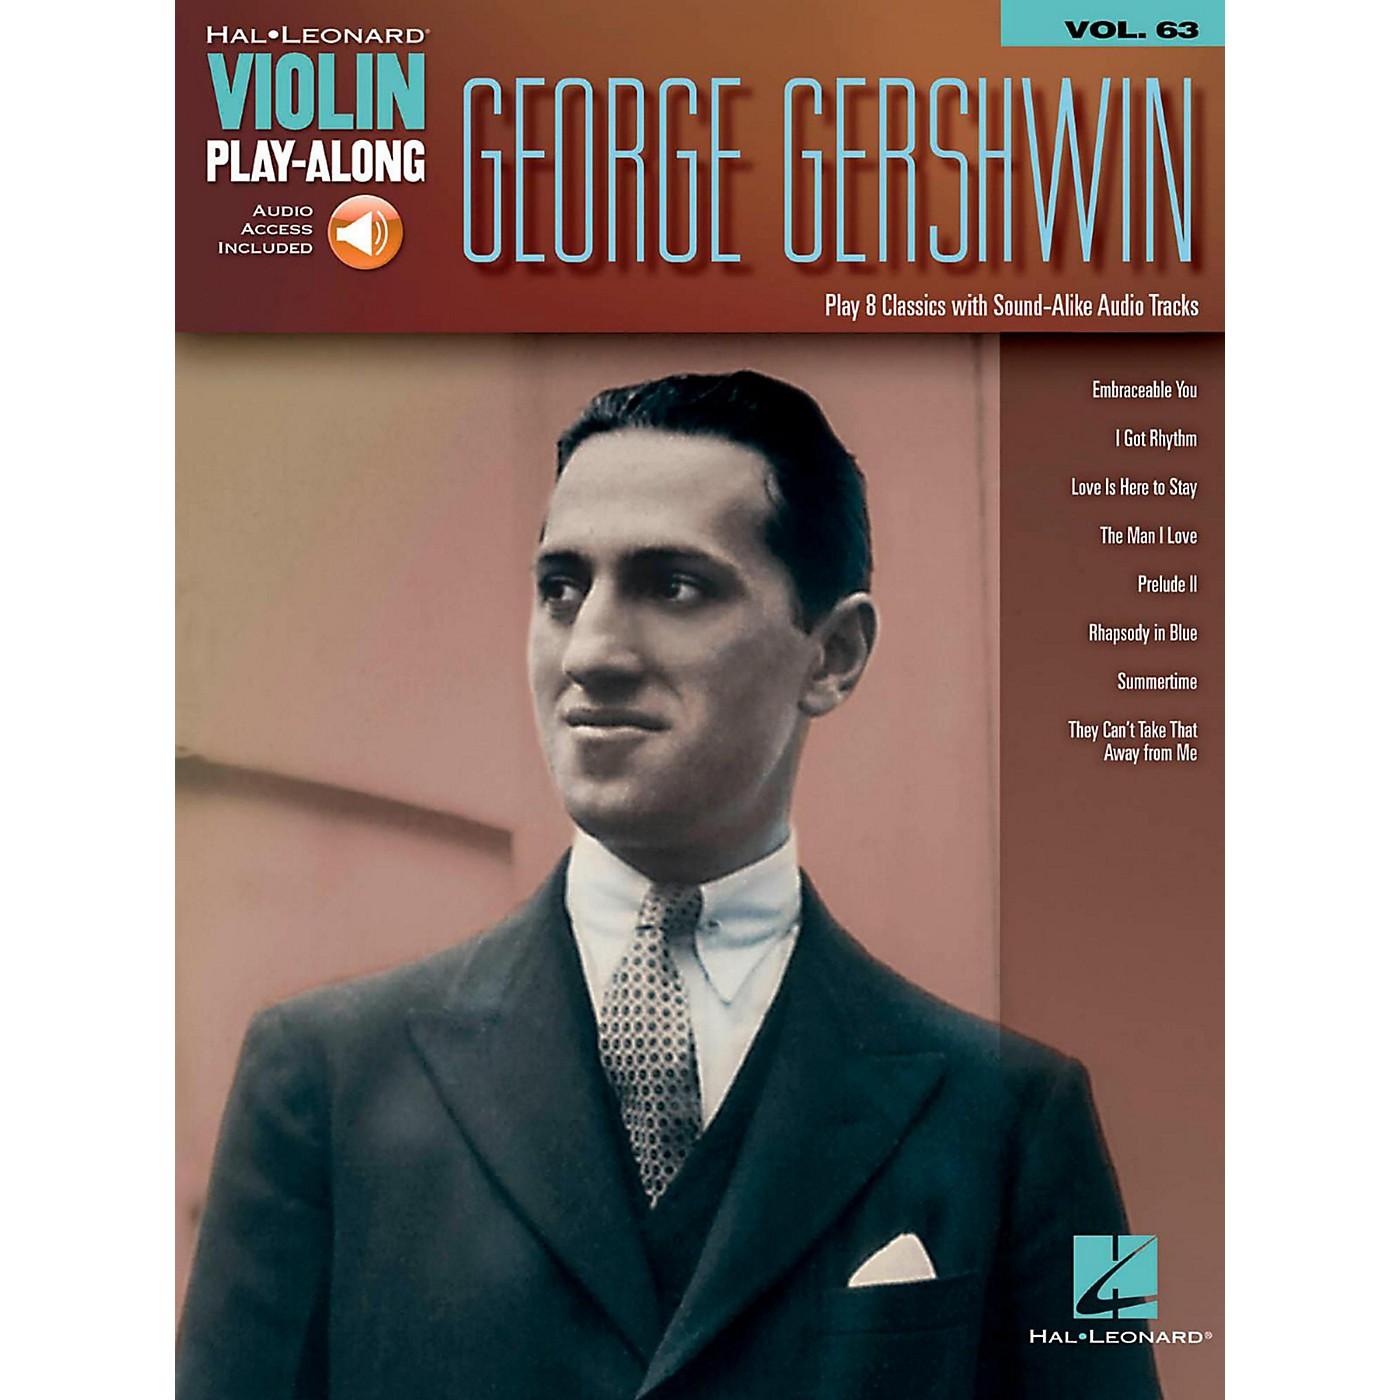 Hal Leonard George Gershwin - Violin Play-Along Volume 63 (Book/Audio Online) thumbnail